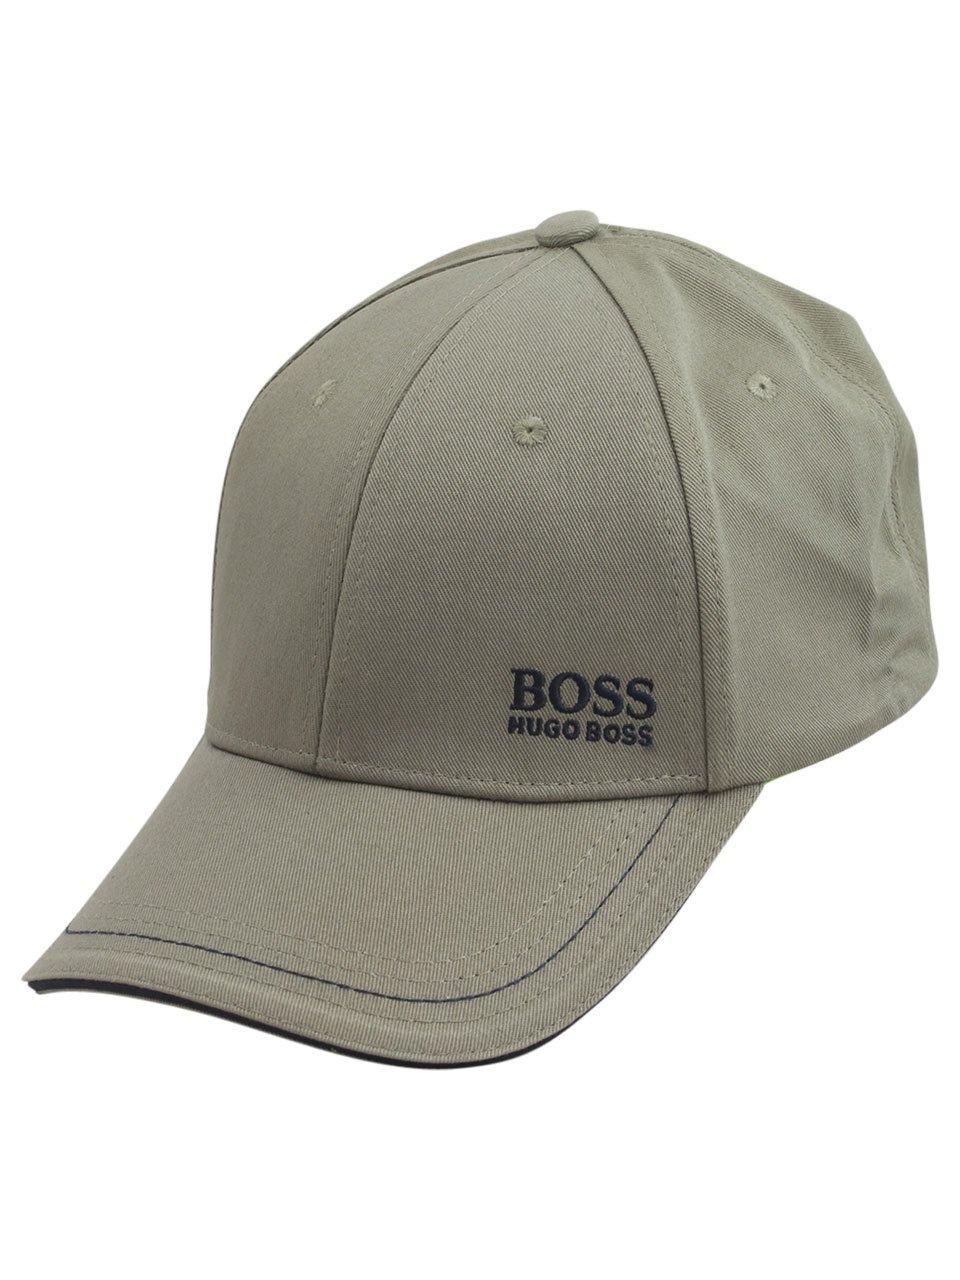 Hugo Boss Cap-1 Open Green Cotton Strapback Baseball Cap Hat (One Size Fit Most)